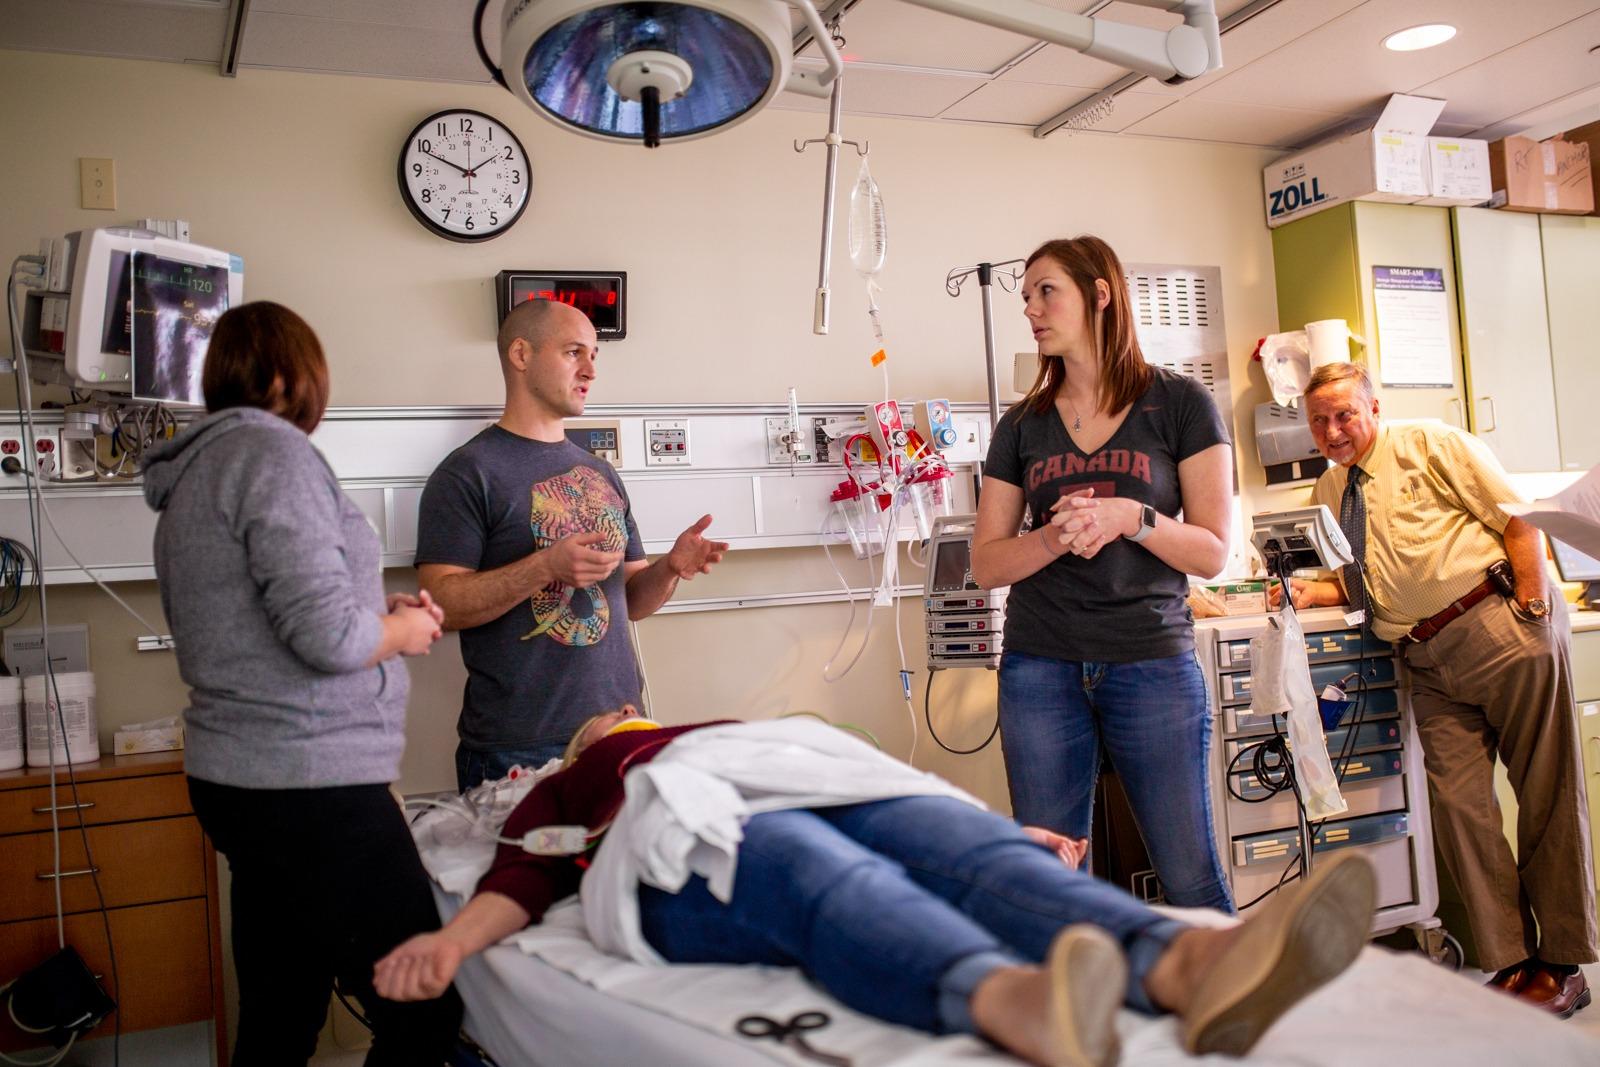 hospital staff discuss their plan